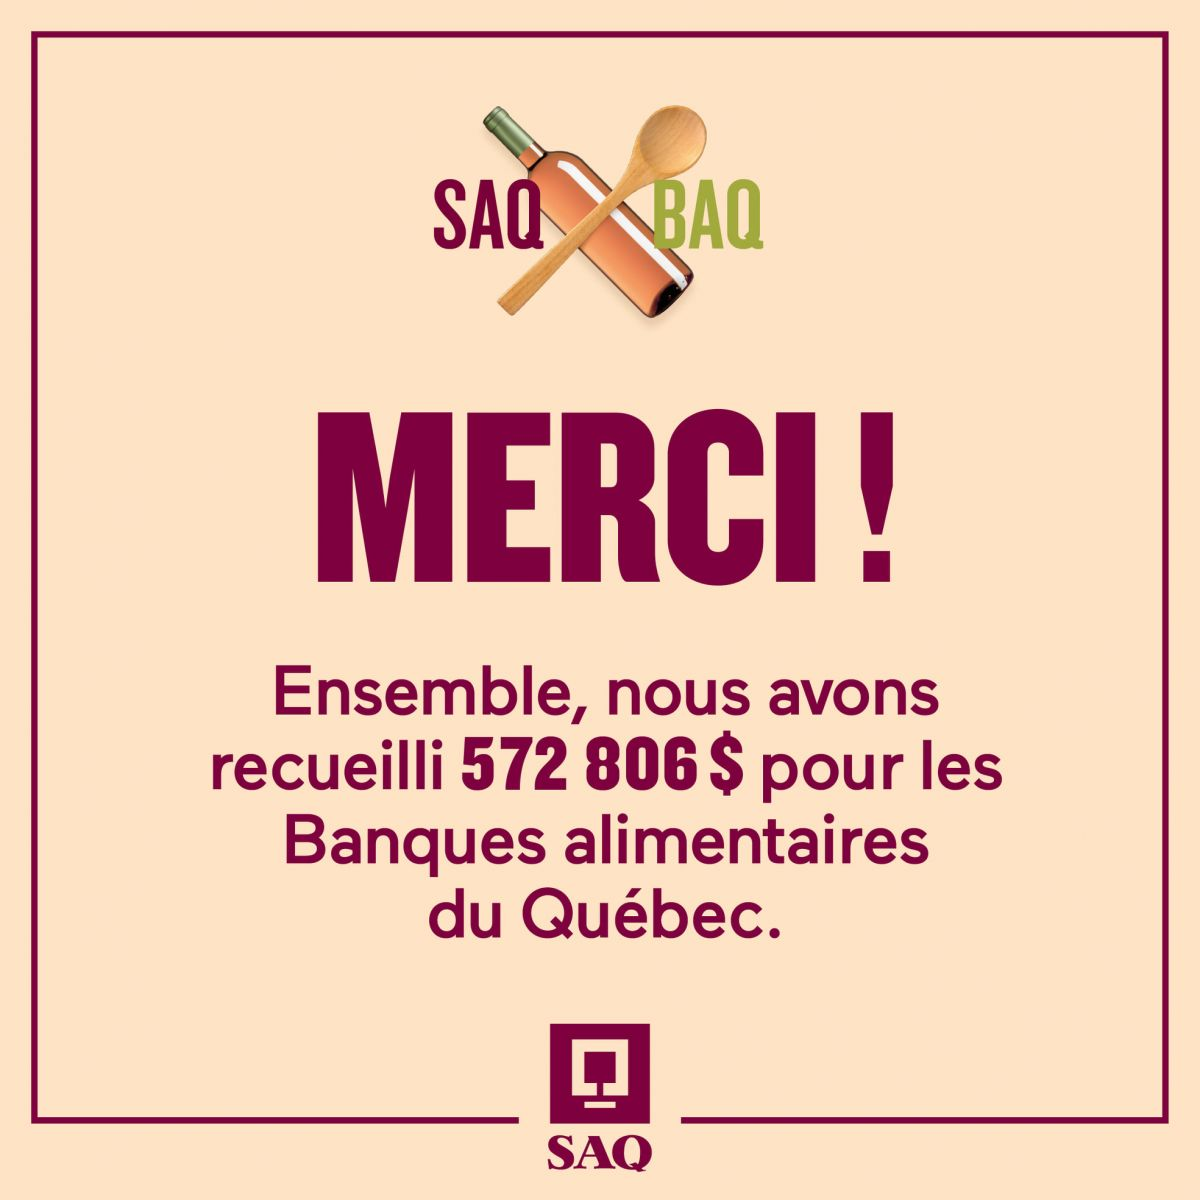 [image] SAQ BAQ | Merci! | Ensemble, nous avons recueilli 572 806$ pour les banques alimentaires du Québec. | SAQ